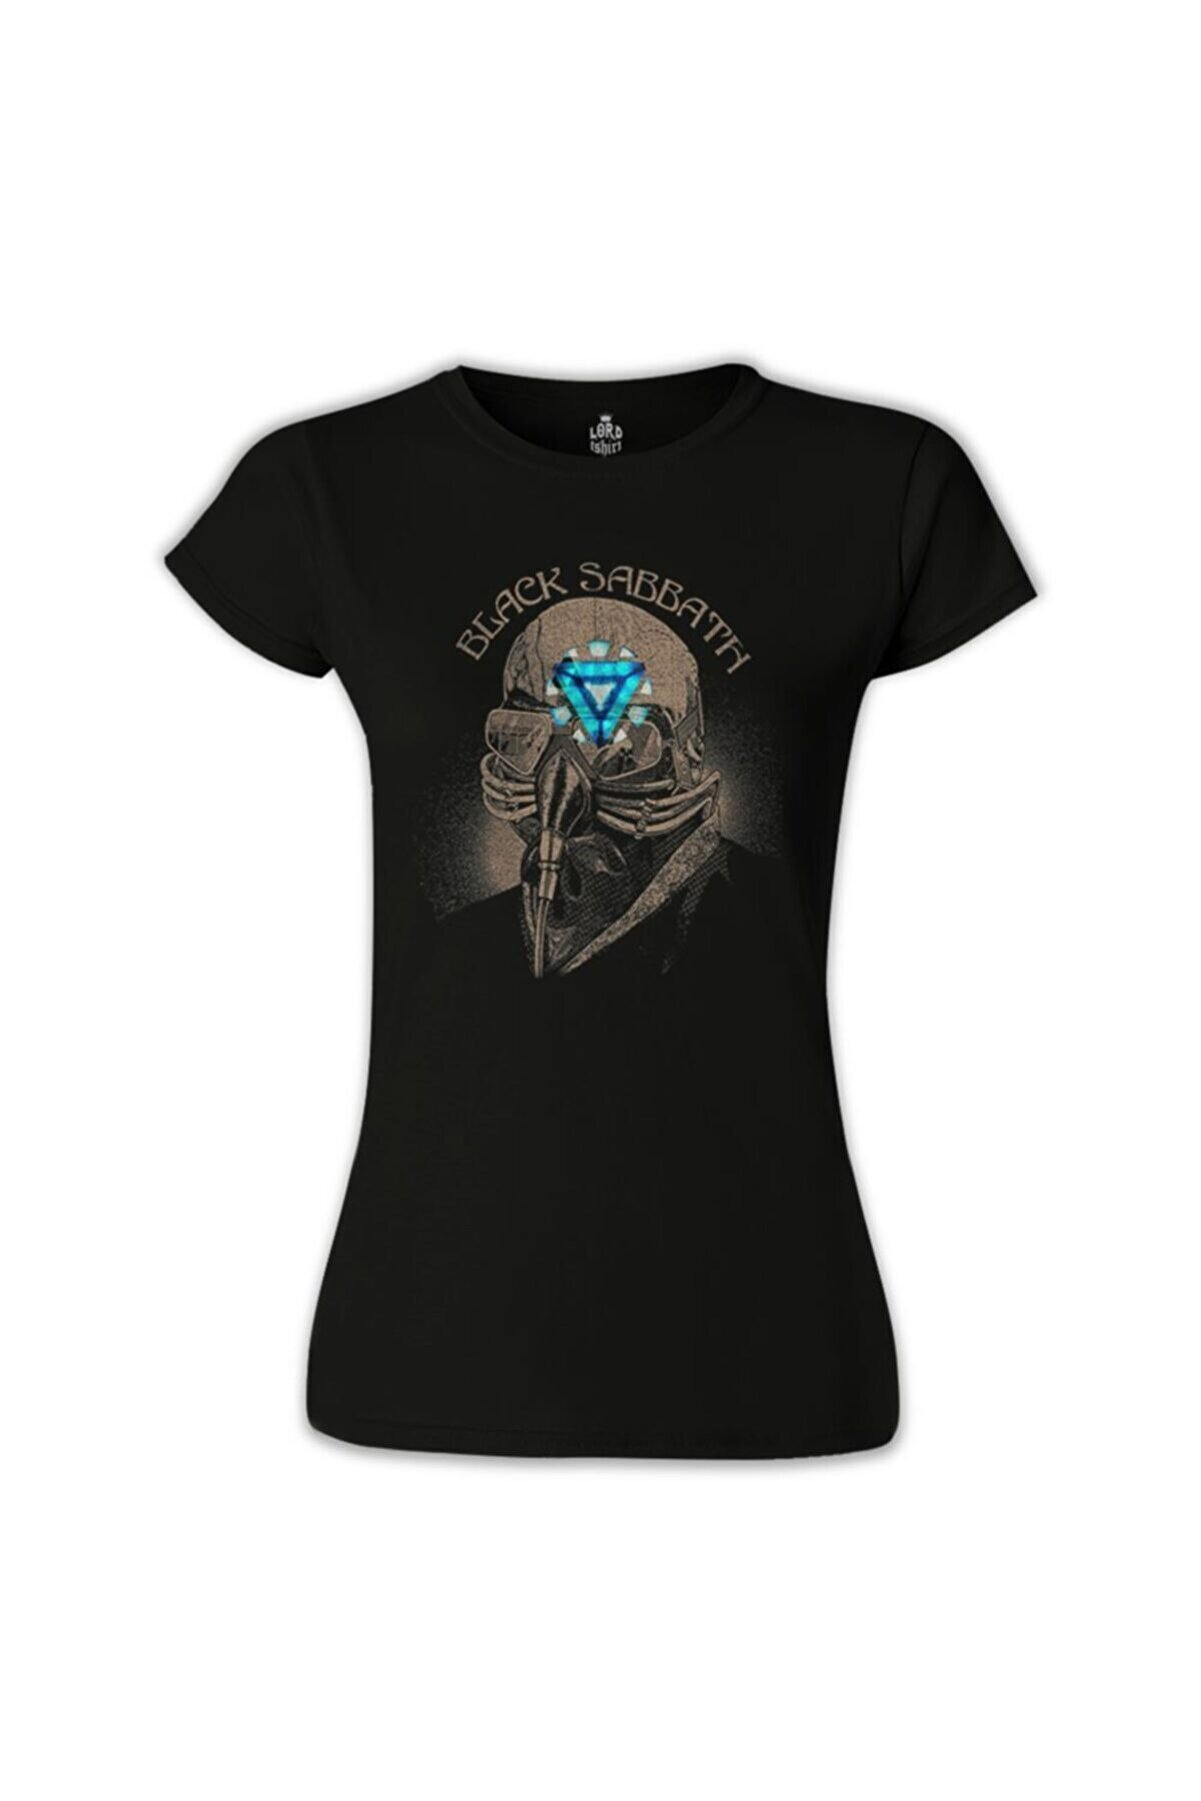 Lord T-Shirt Kadın Siyah Black Sabbath Arc Reactor Tshirt - BS-636